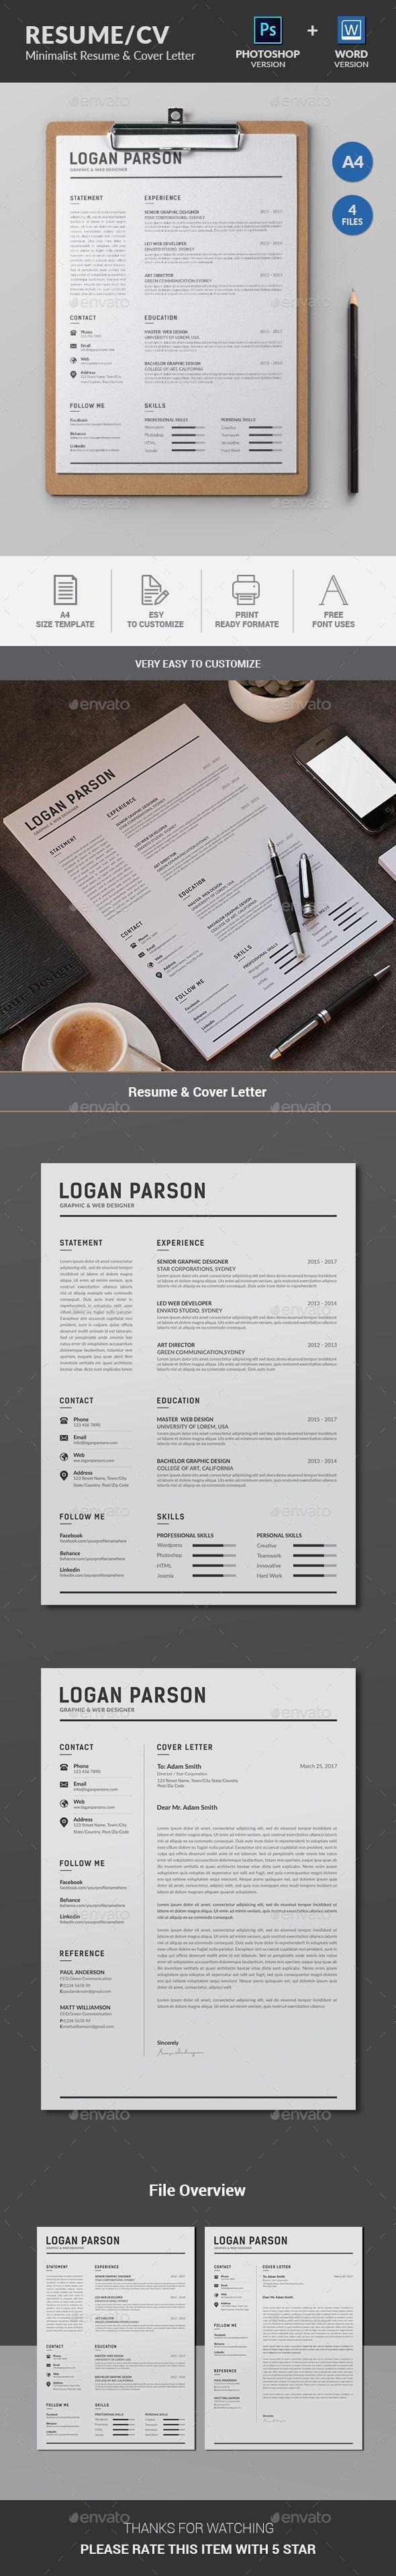 Resume Minimalist resume template focusing NameExperienceEducation and